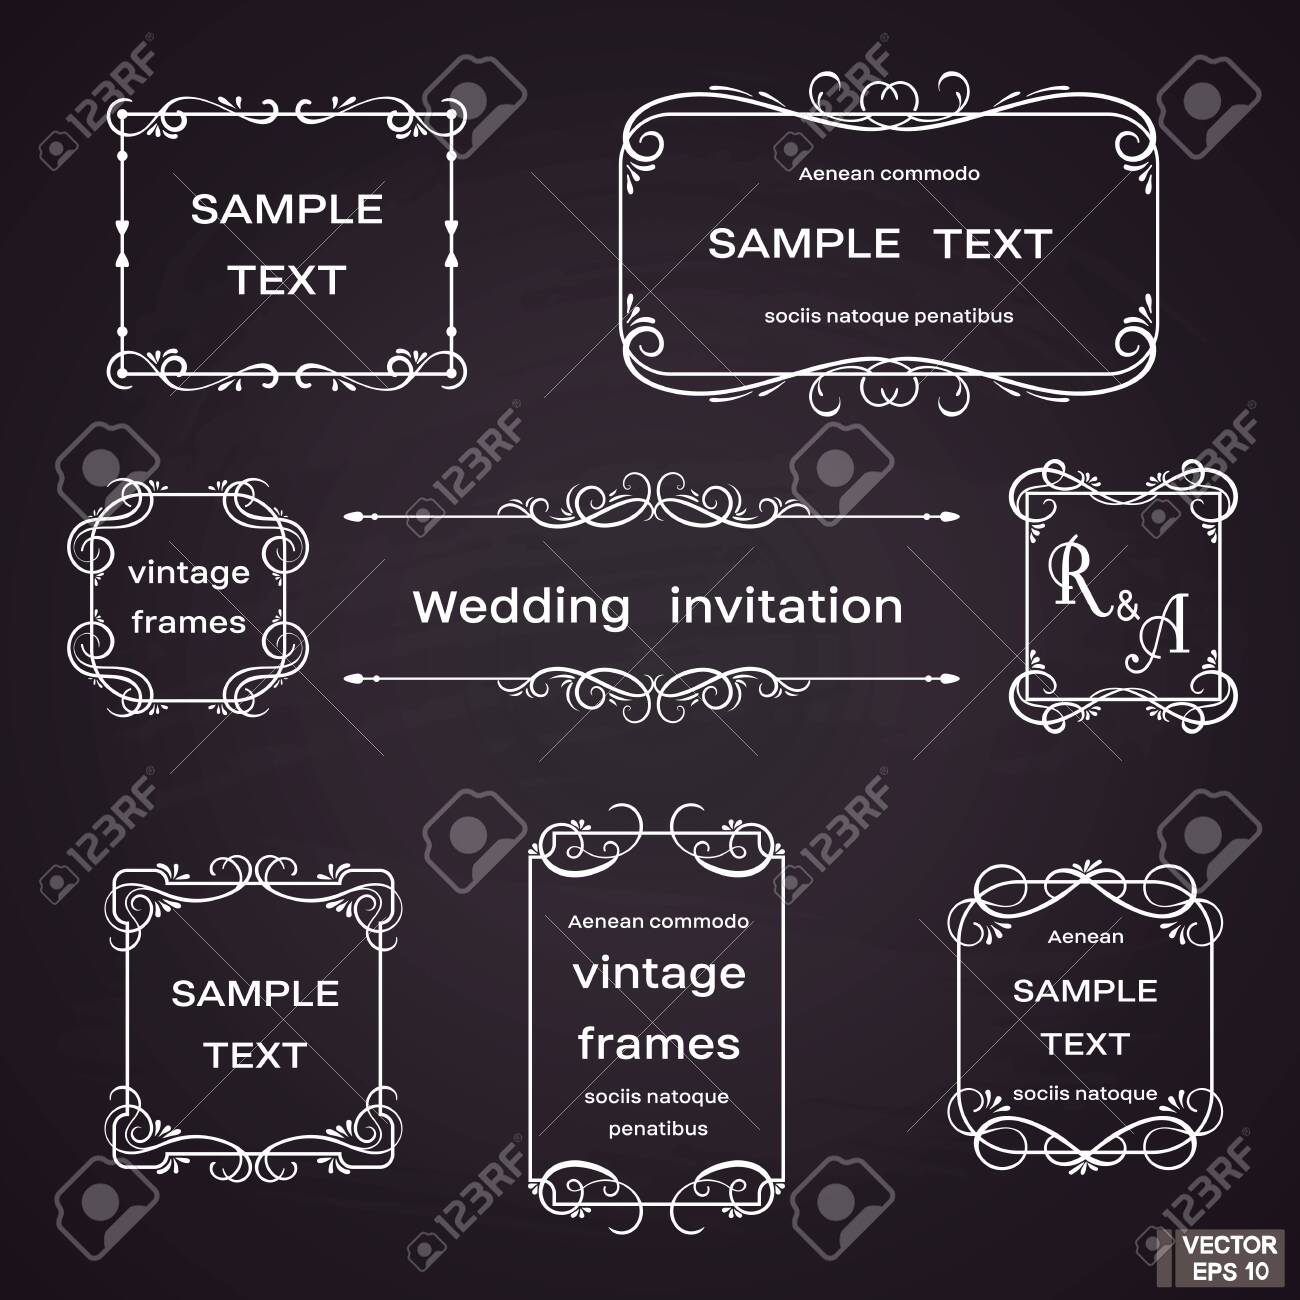 Vector image. Set of vintage frames with floral scrolls and curls. White on black background. - 141474690